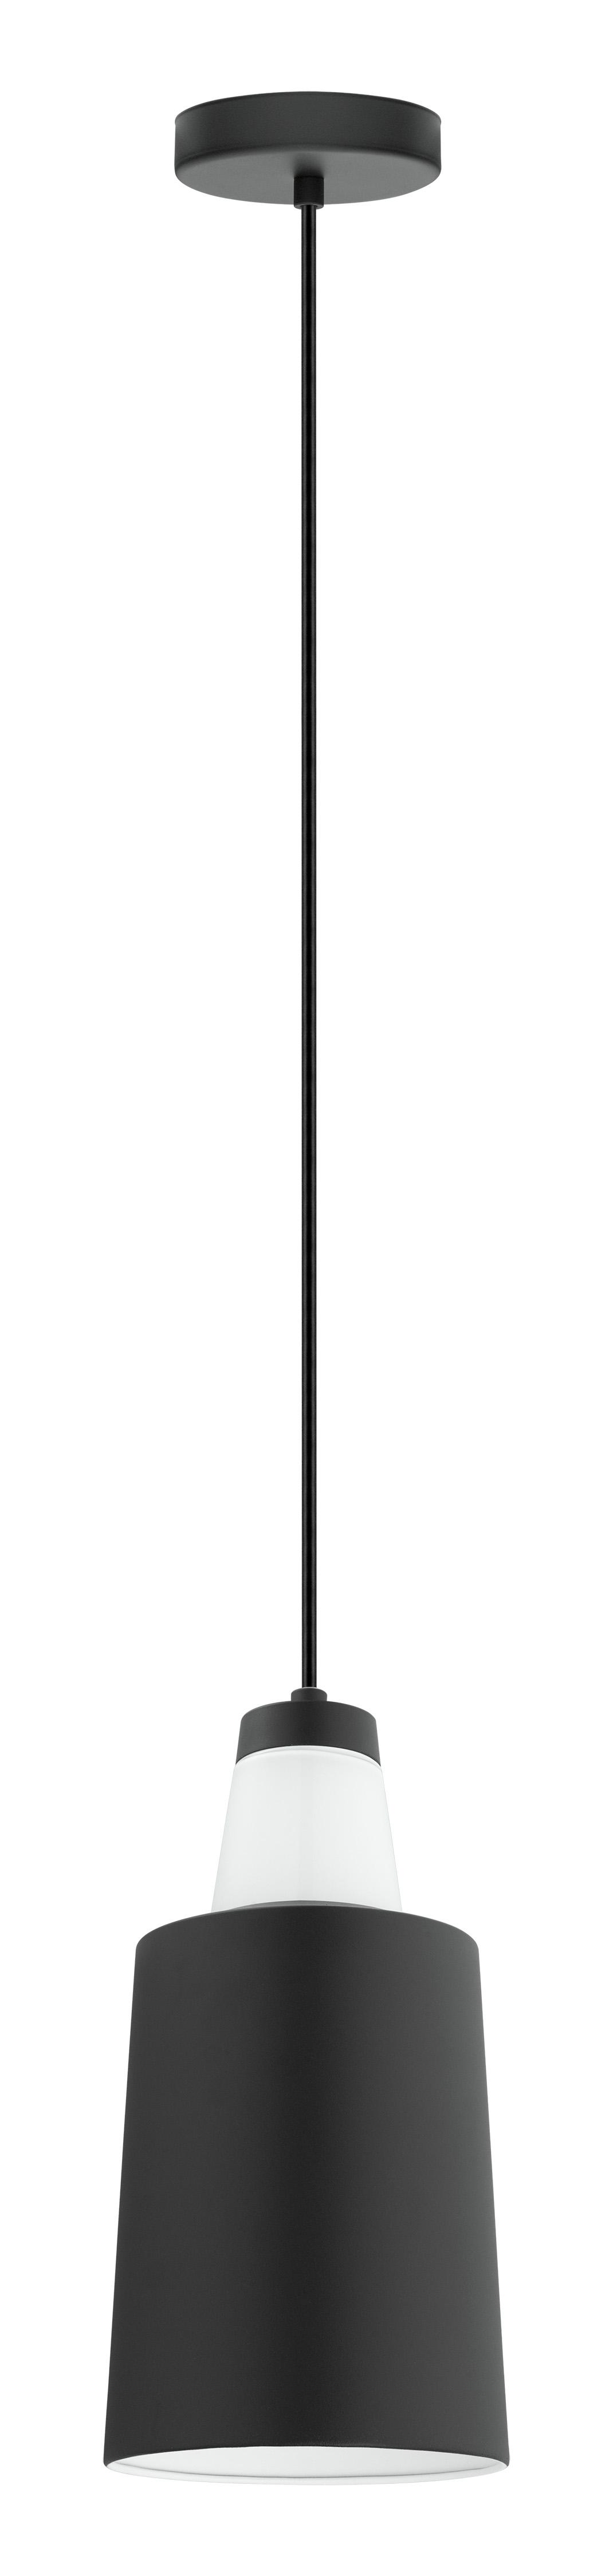 Pendant Lighting Modern TABANERA Eglo 96801A